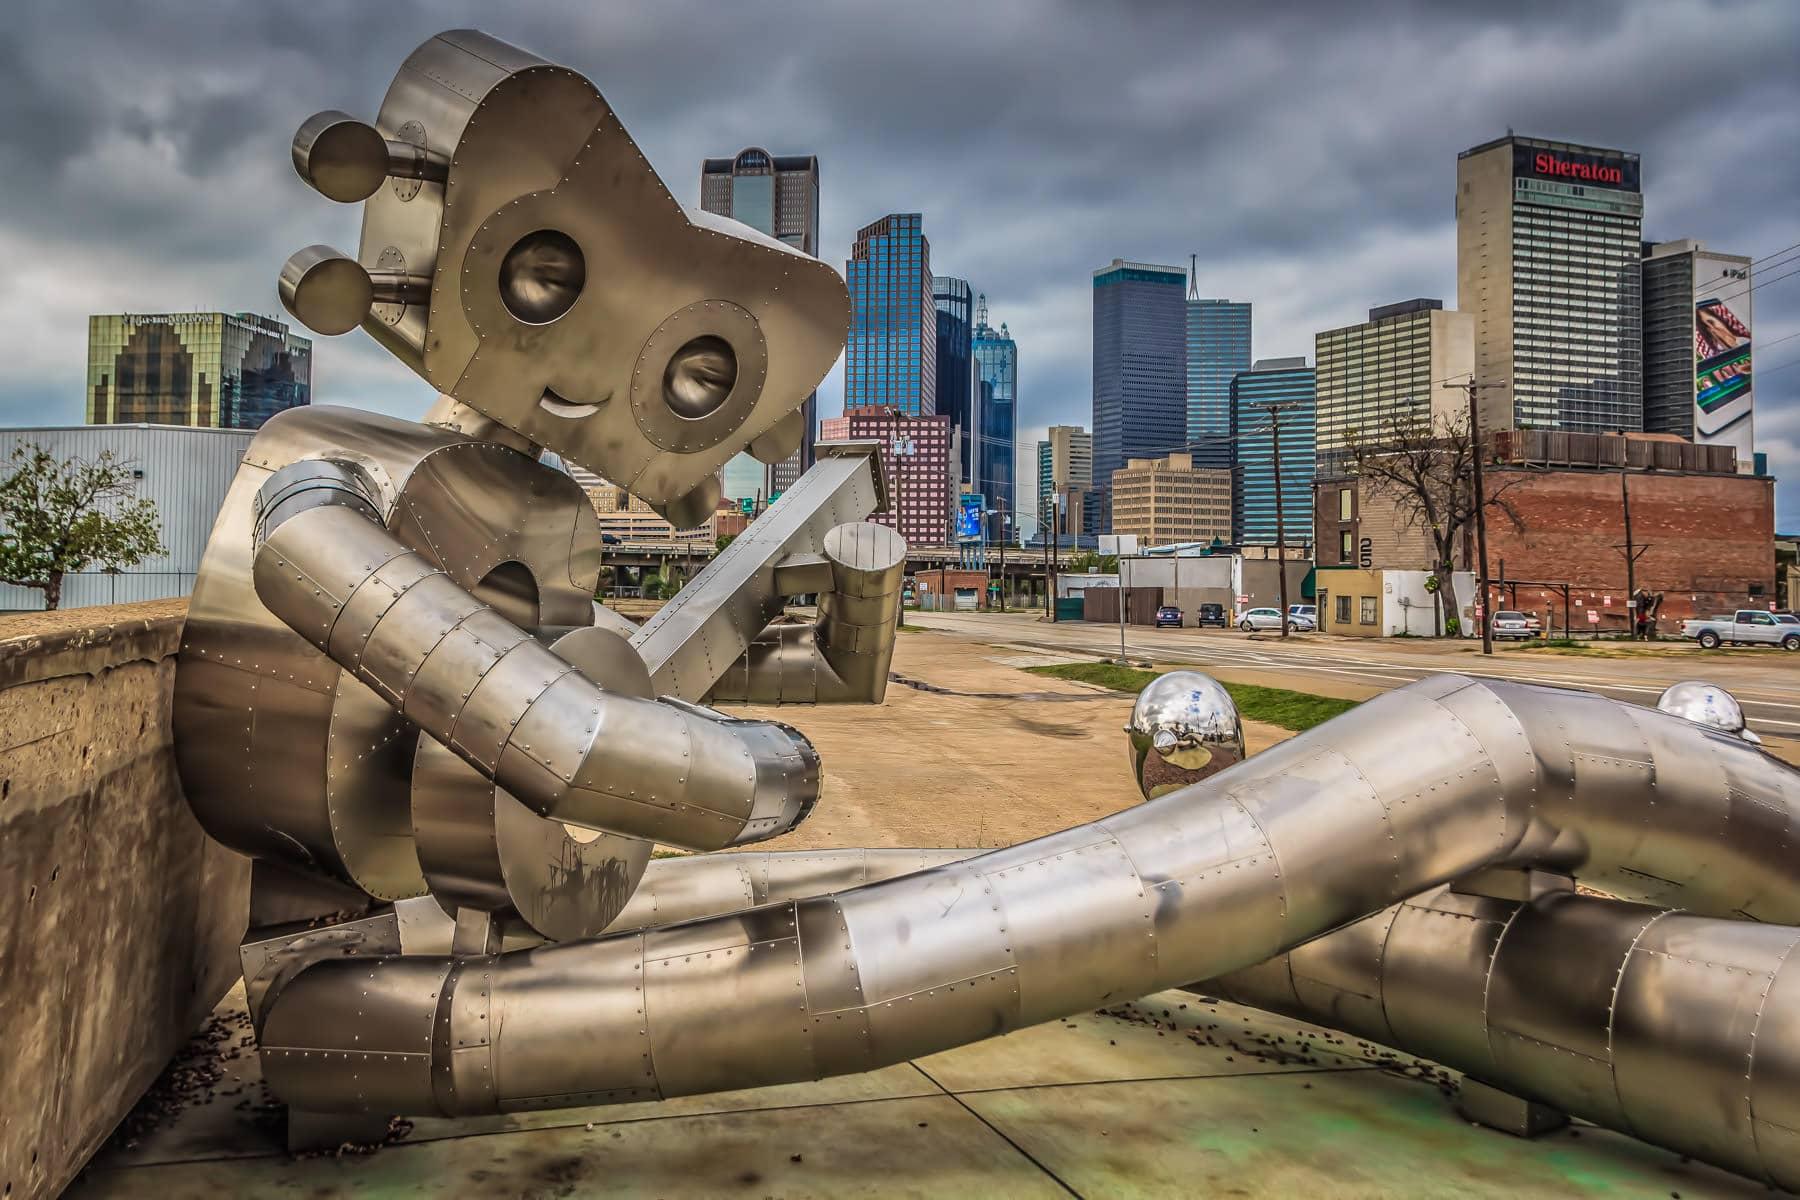 Dallas' Traveling Man sculpture—a landmark in the Deep Ellum neighborhood—against the city's downtown skyline.